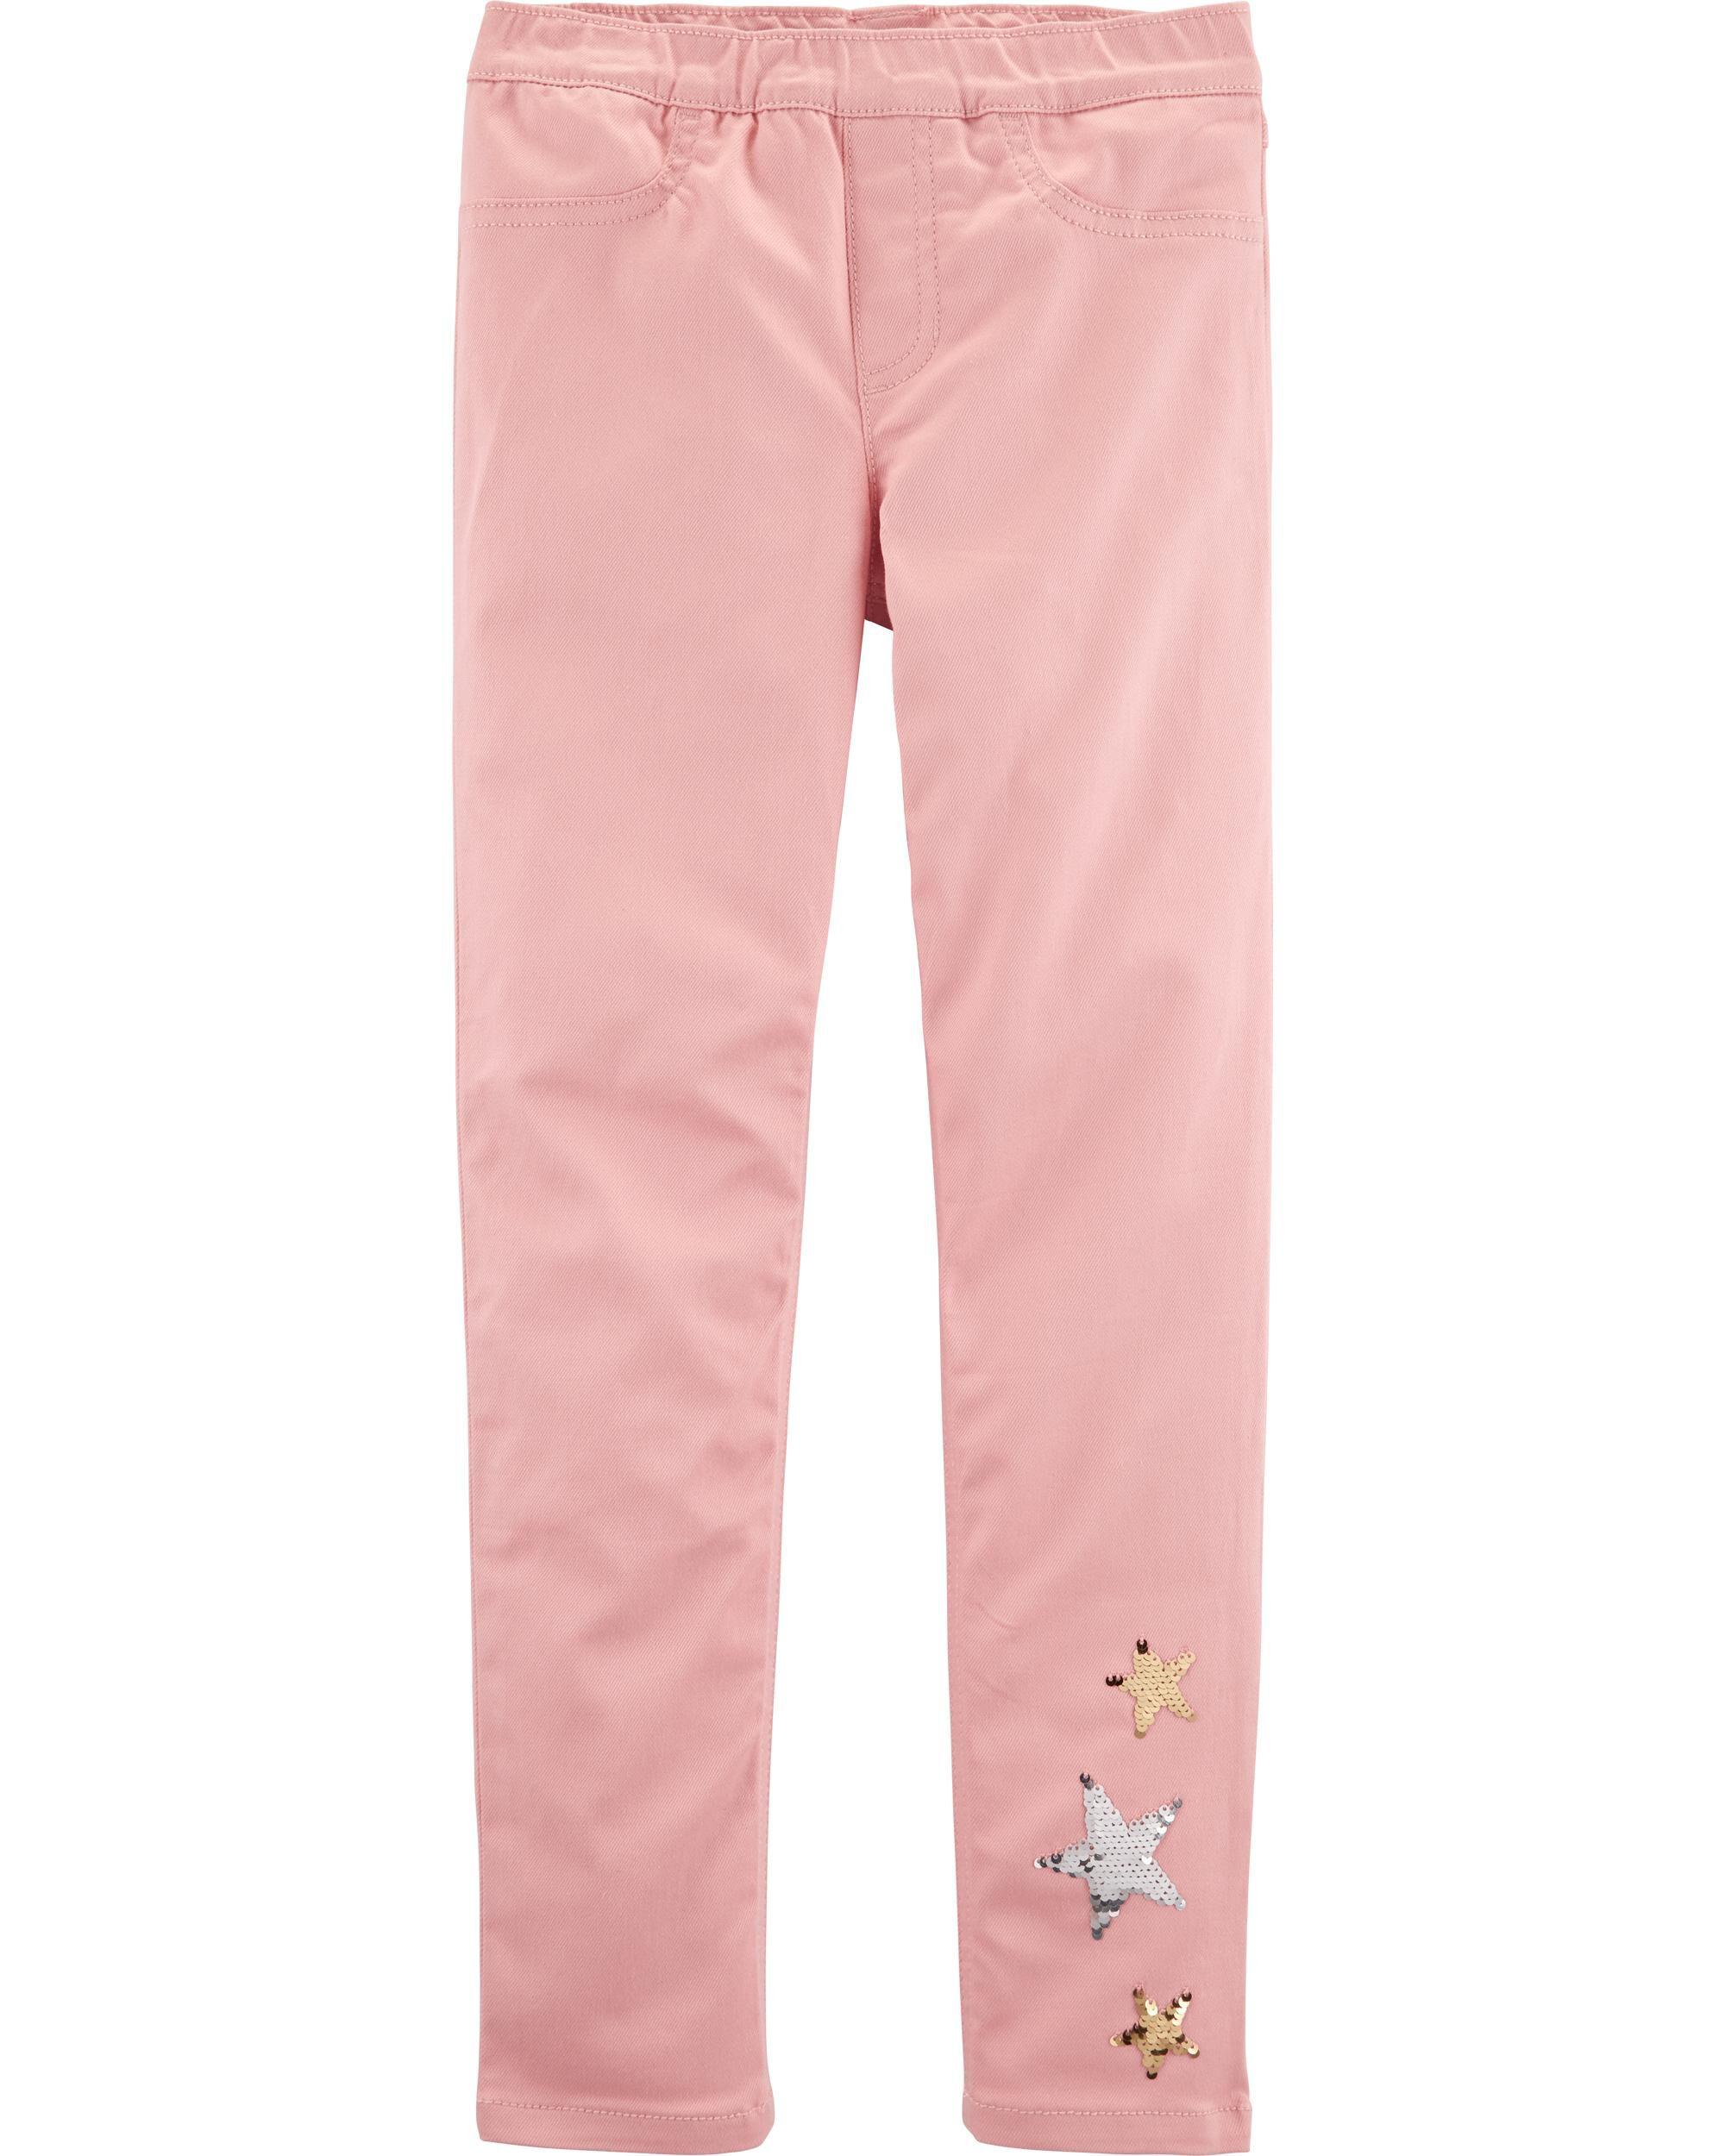 3T Carters Little Girls 5-Pocket Stretch Twill Pants